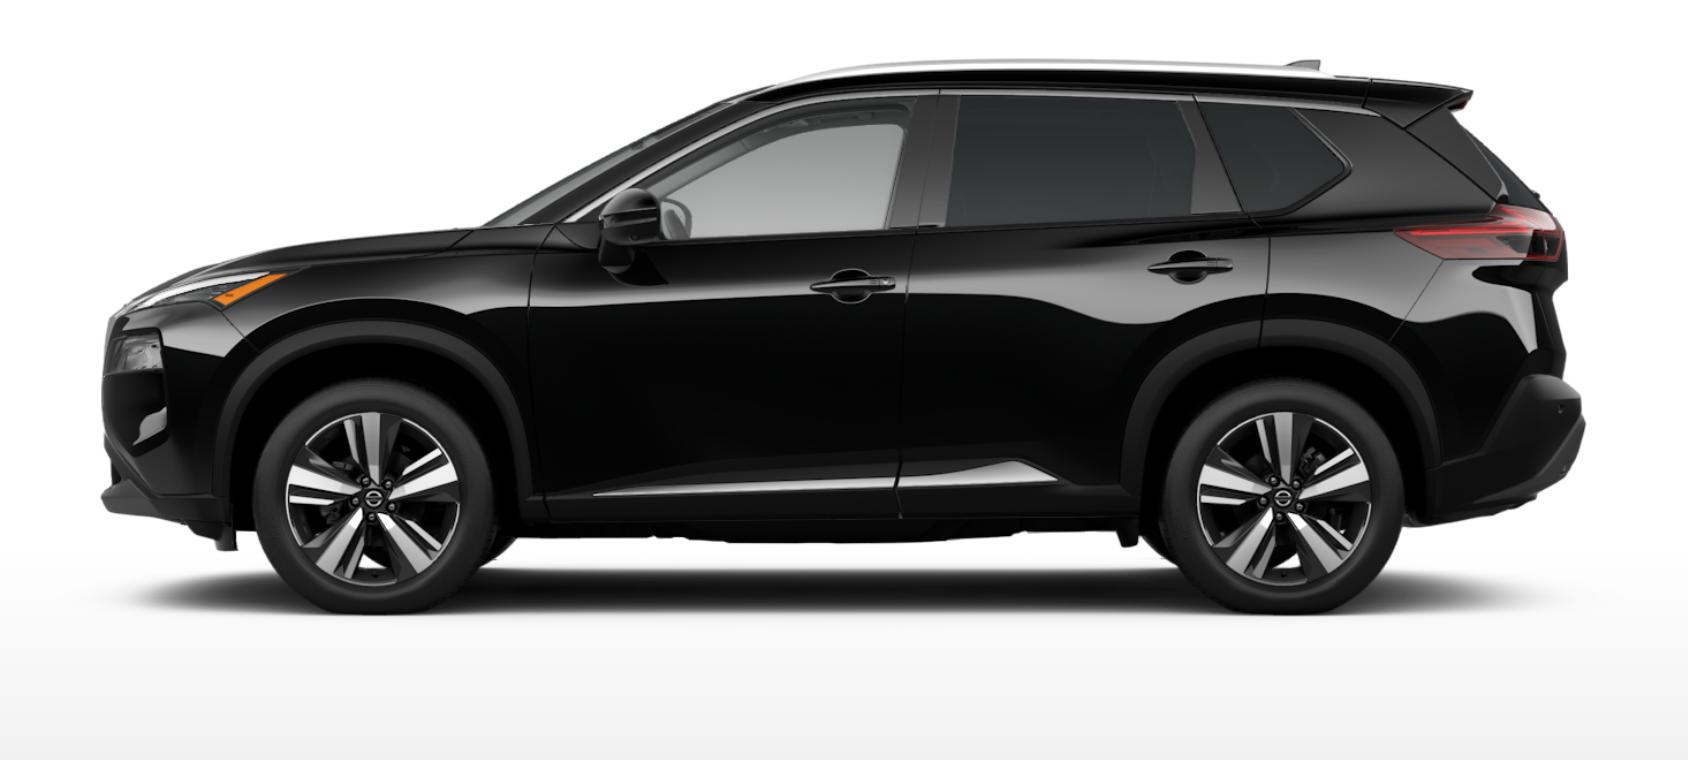 2021 Nissan Rogue Model Information - Autobarn Nissan